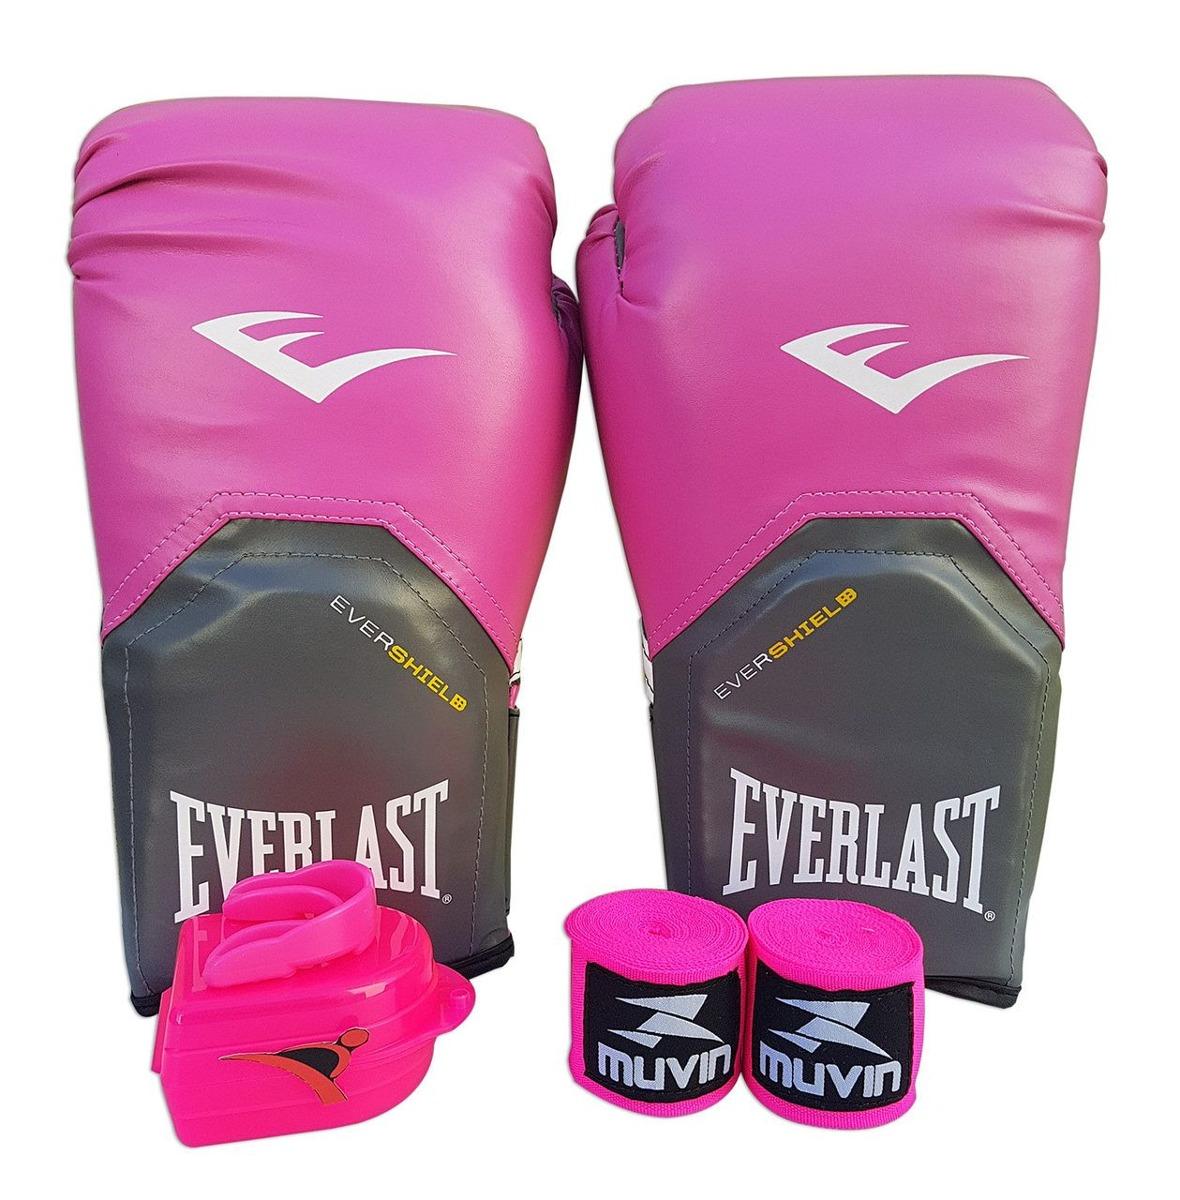 be56607fa kit boxe muay thai feminino 14oz - rosa - pro style everlast. Carregando  zoom.